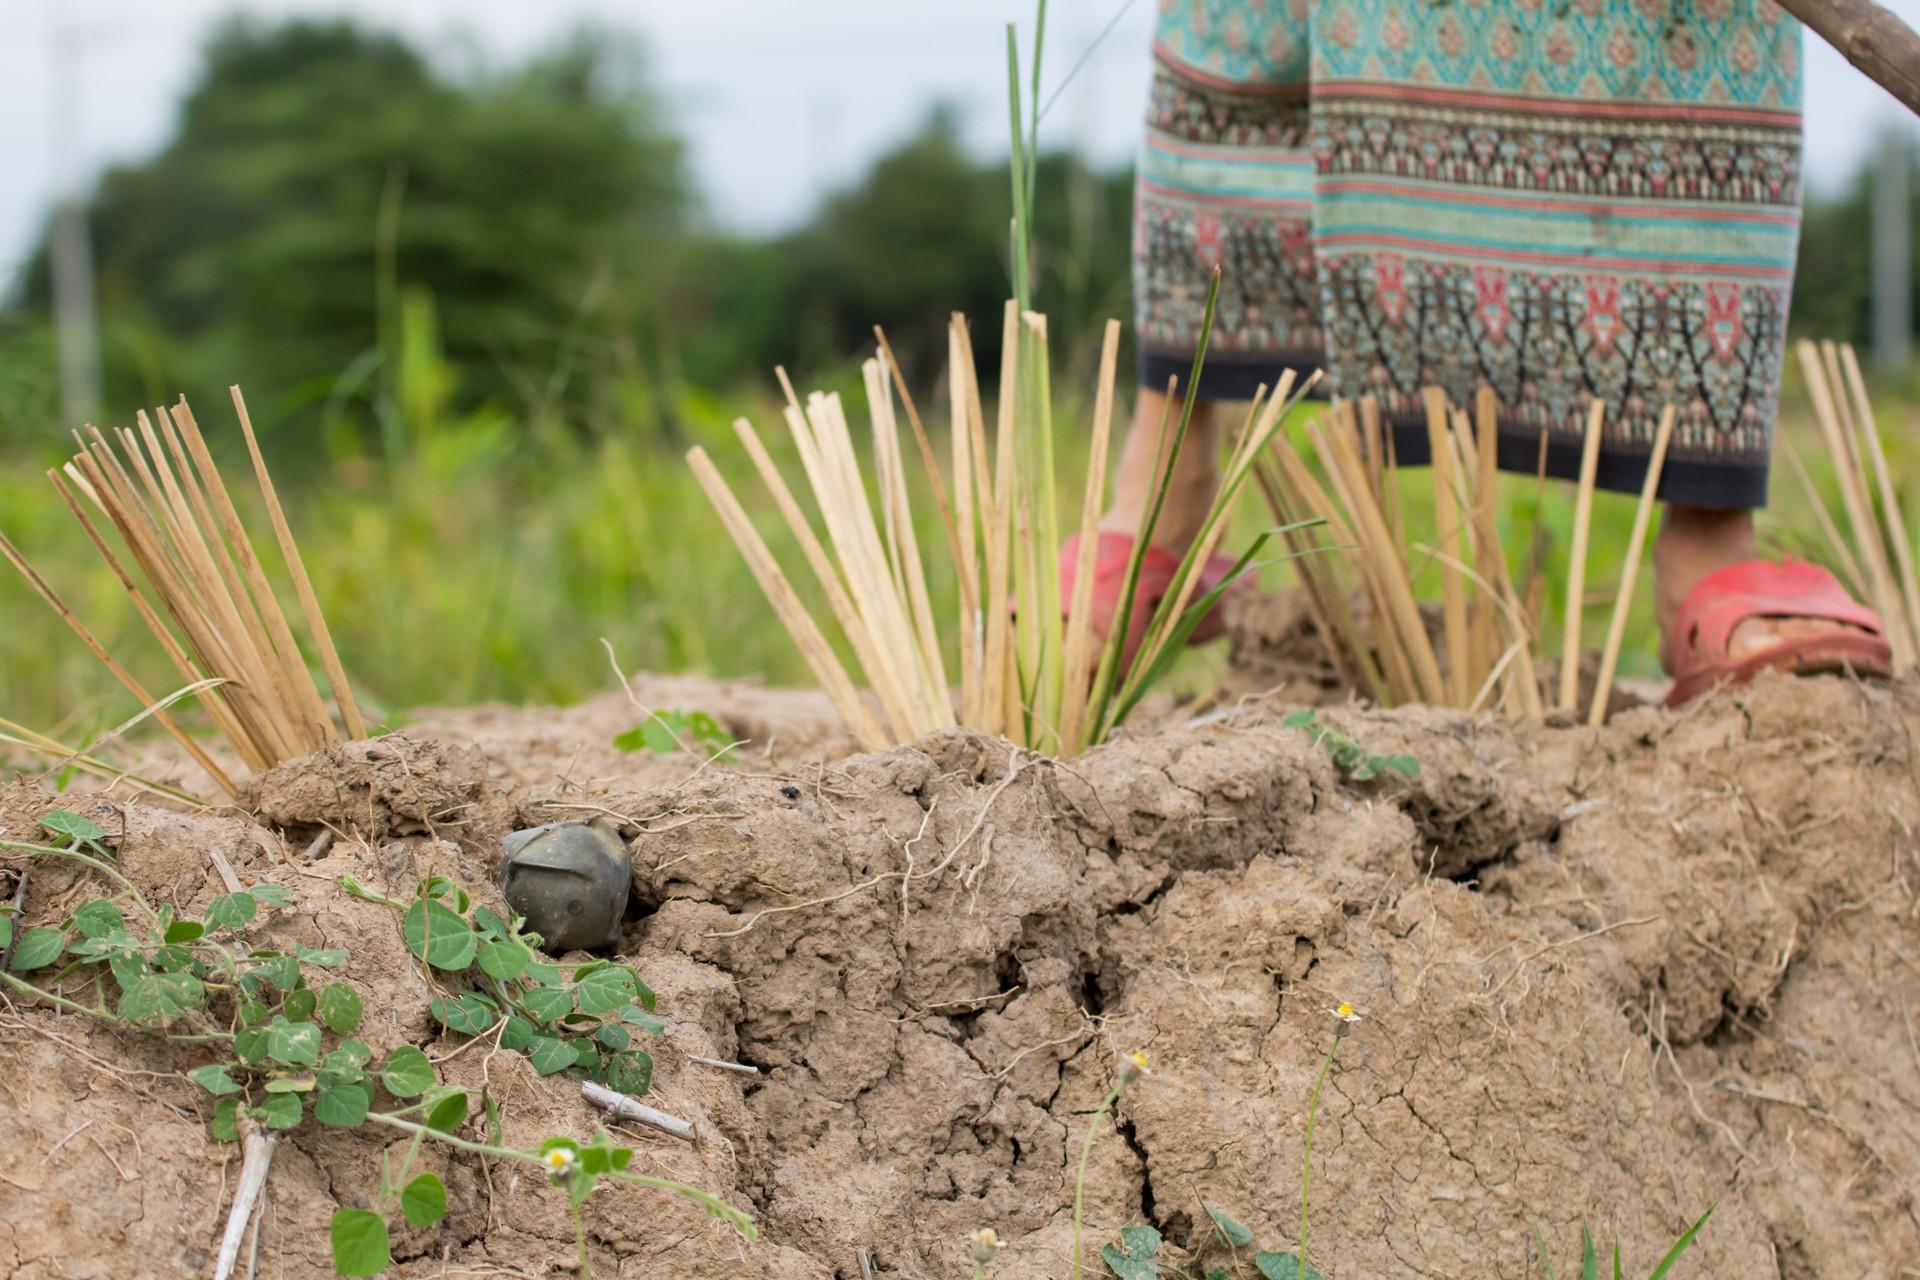 UXO Unexploded mine in rural Laos